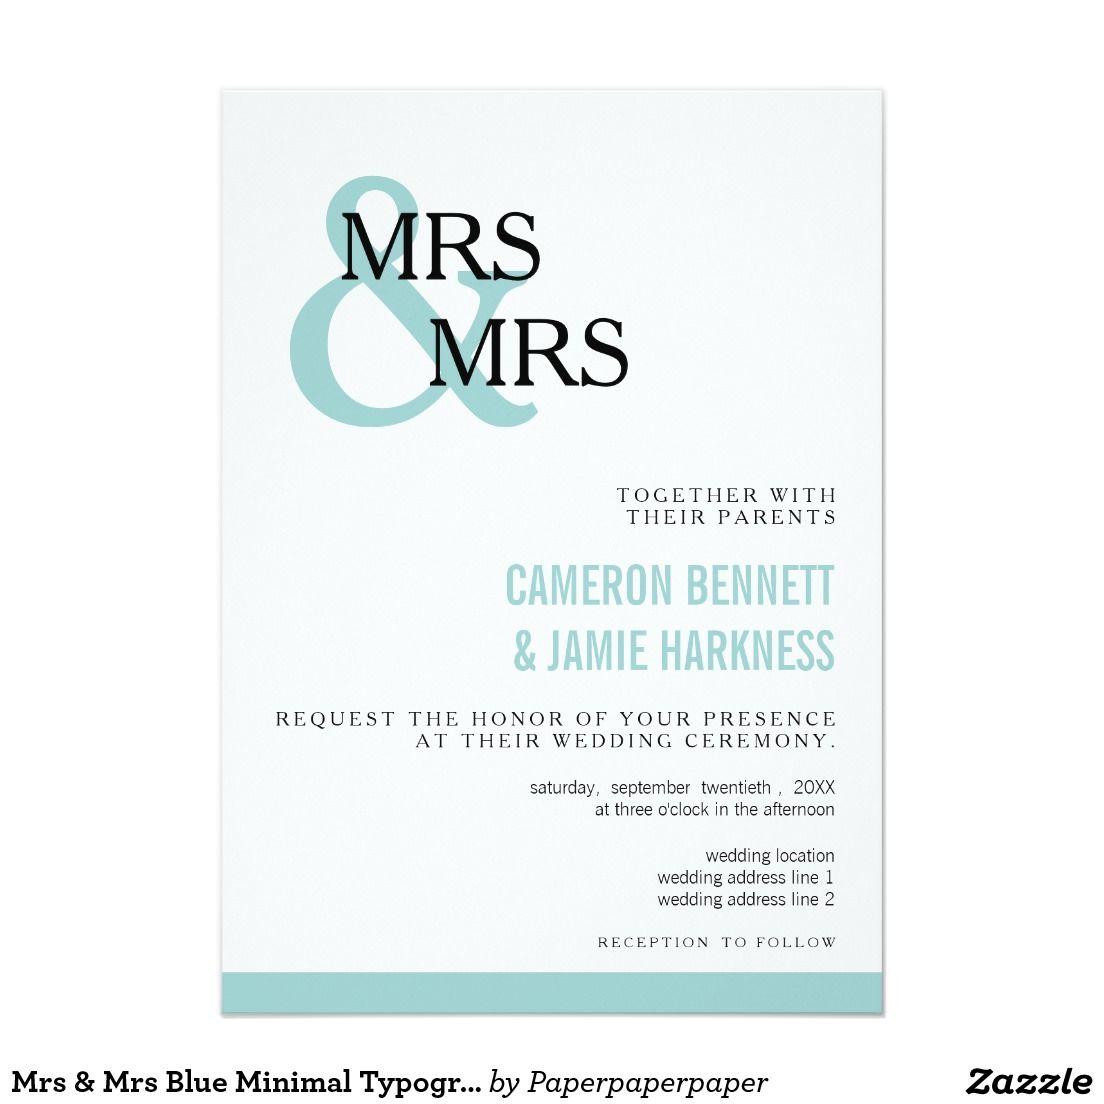 Mrs & Mrs Blue Minimal Typography Wedding | MODERN WEDDING ...